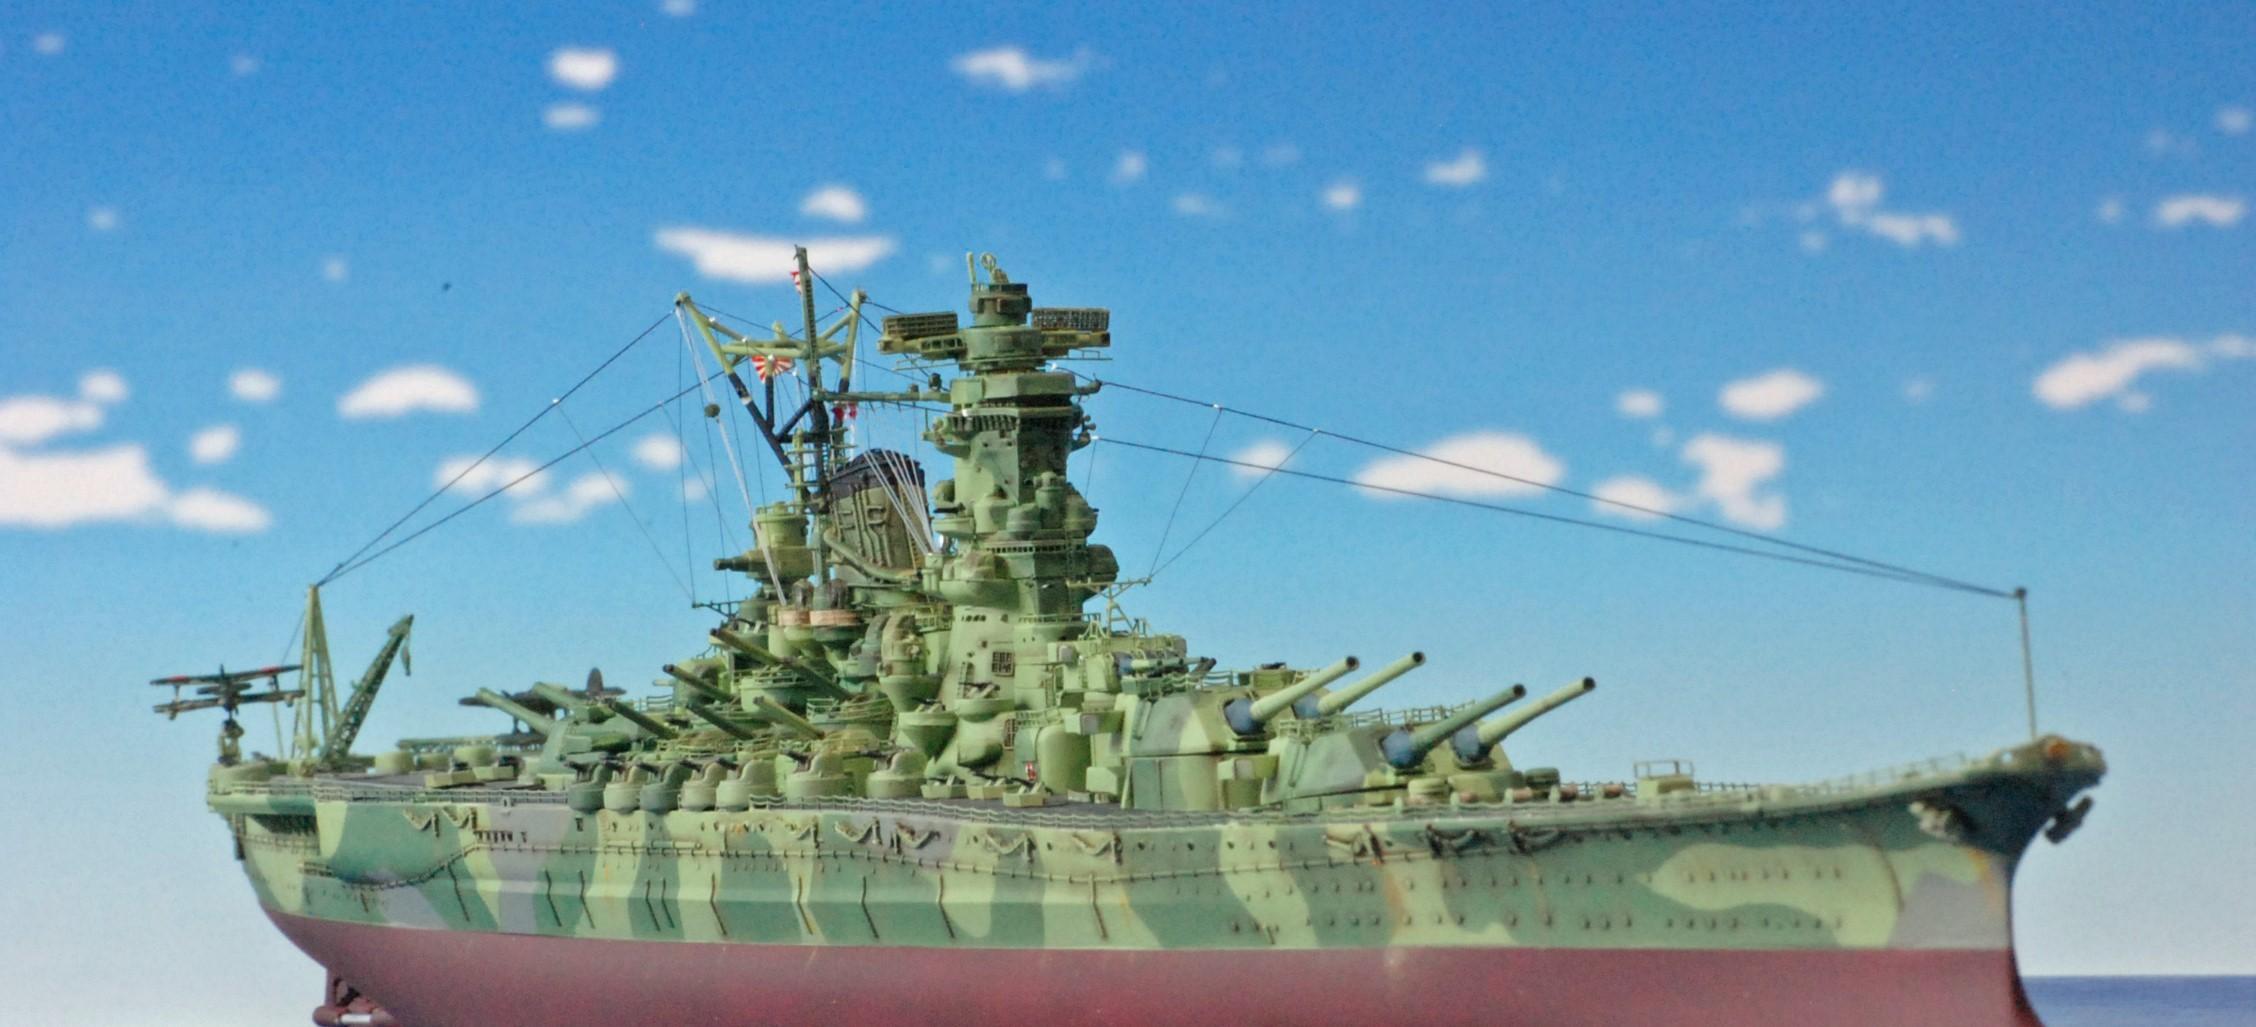 IJN Yamato au 1/200 de chez Nichimo et Fujimi Cam-bi10